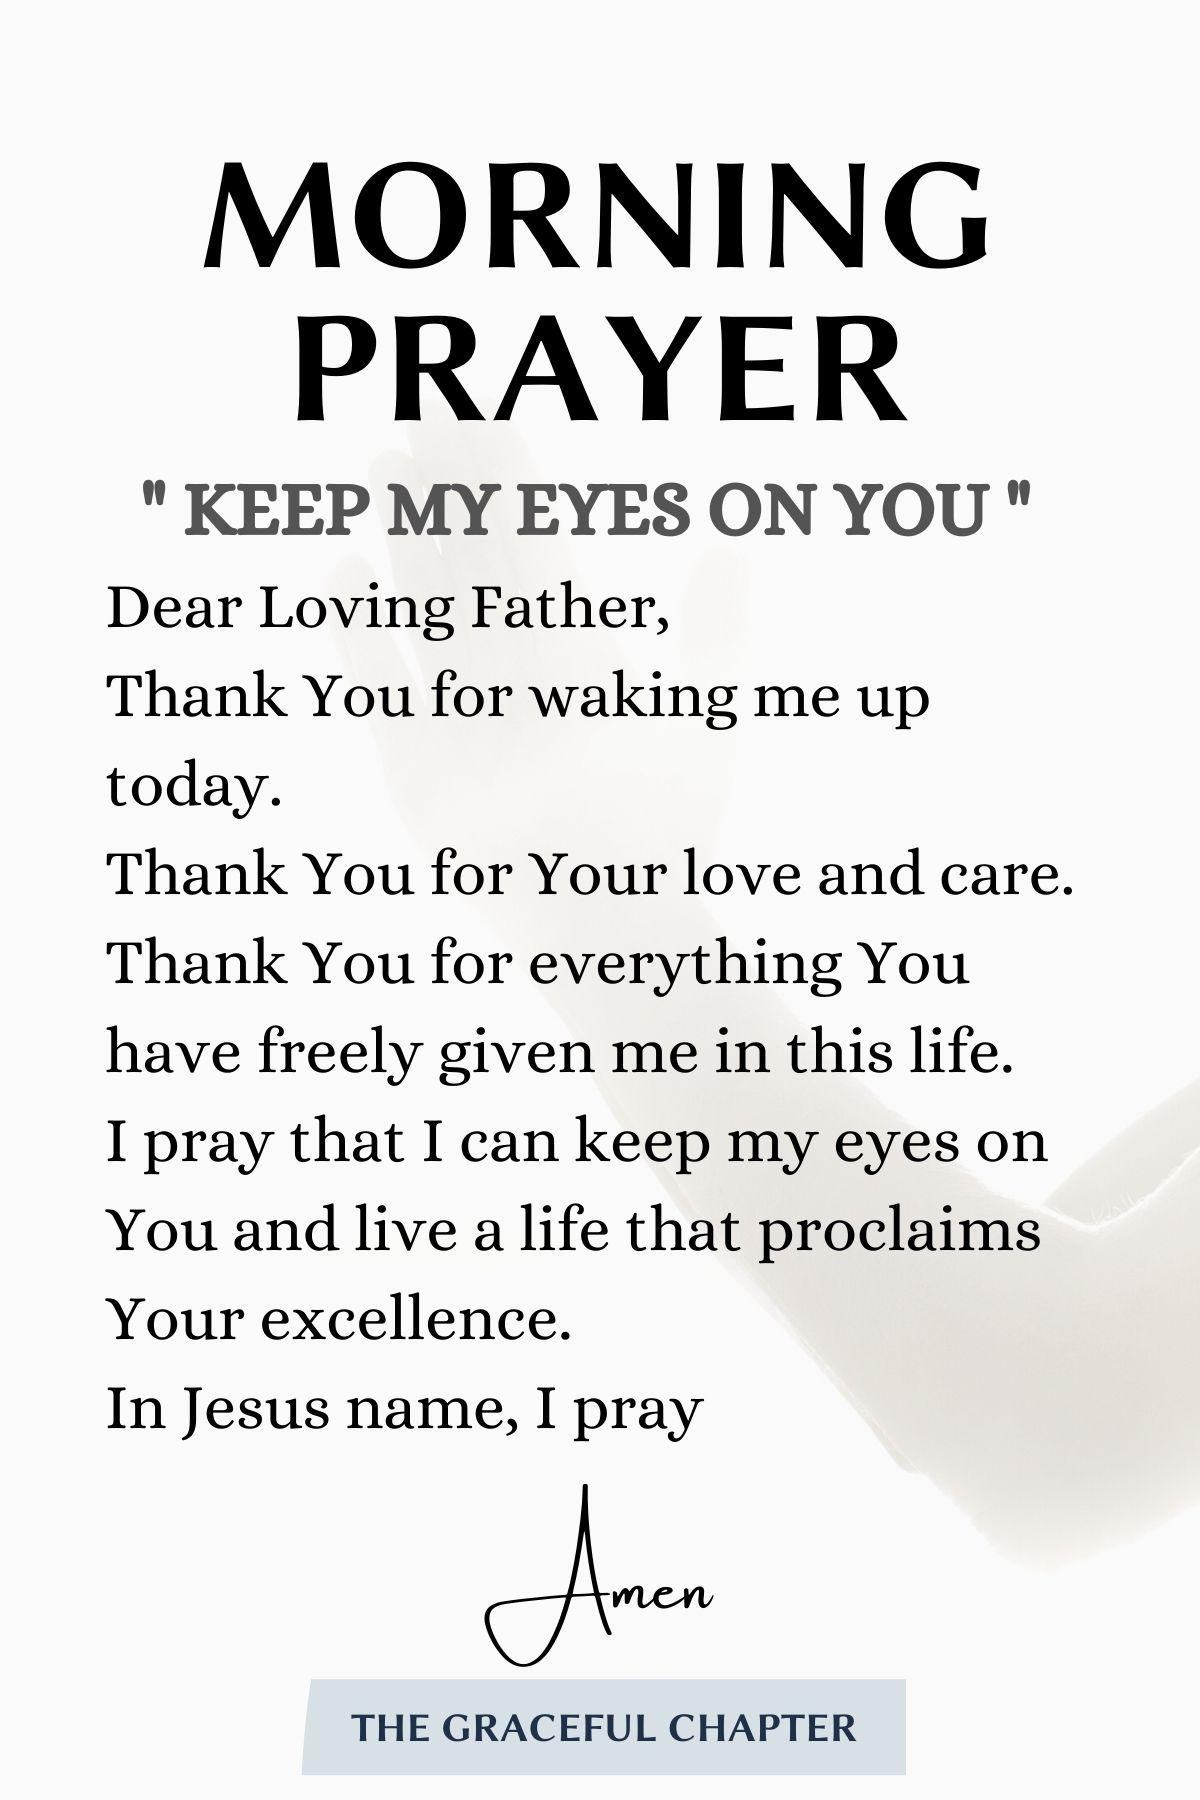 morning prayer: keep my eyes on you